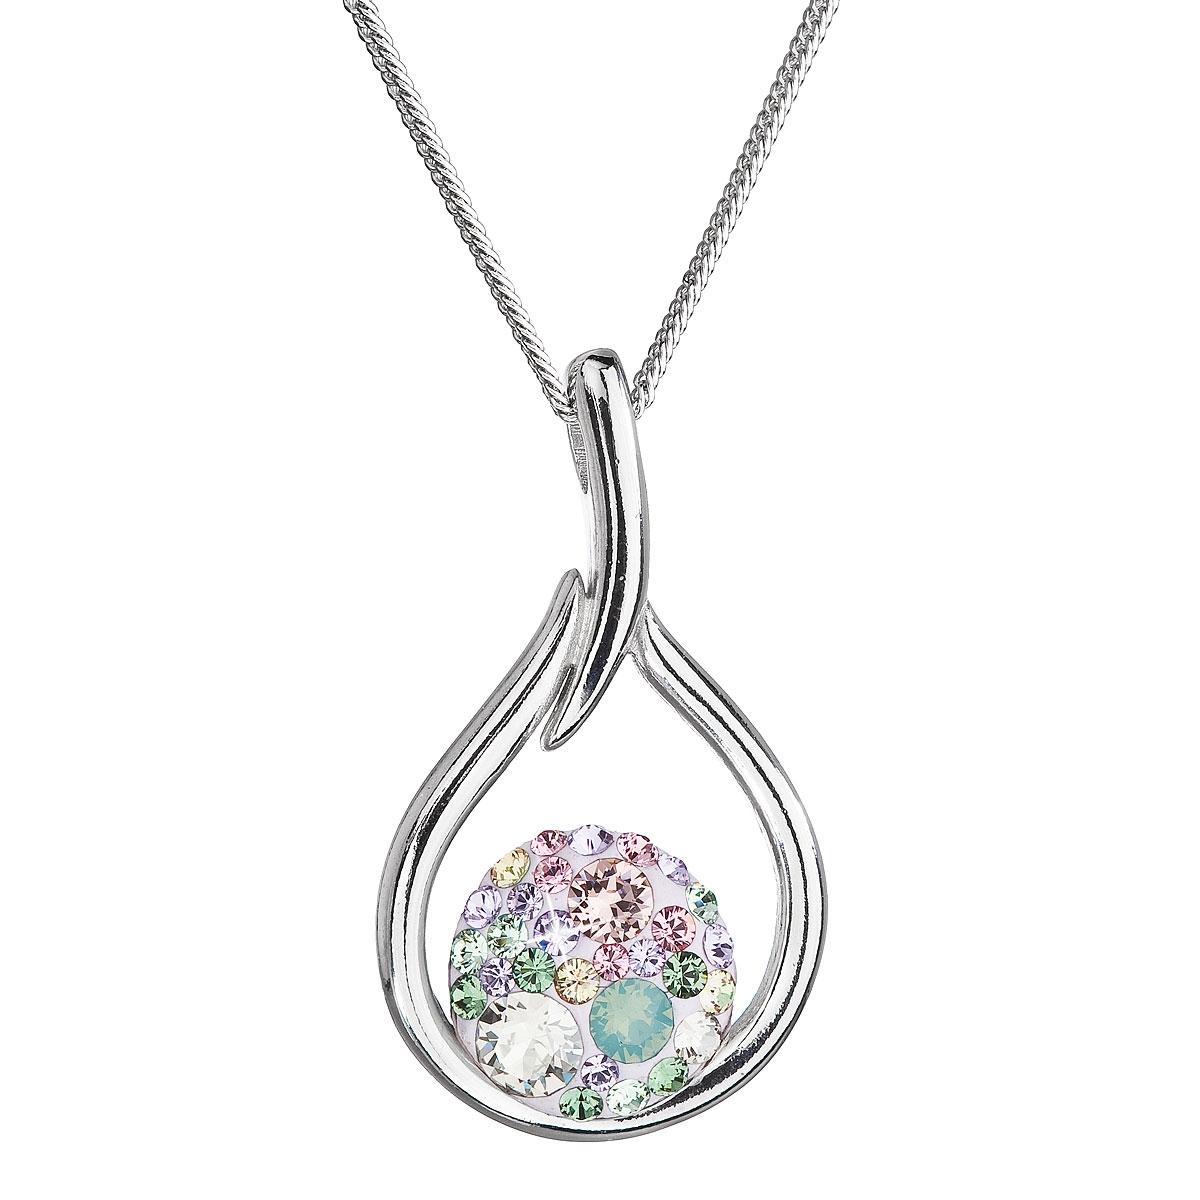 Stříbrný náhrdelník se Swarovski krystaly kapka, Sakura EG4258-SK